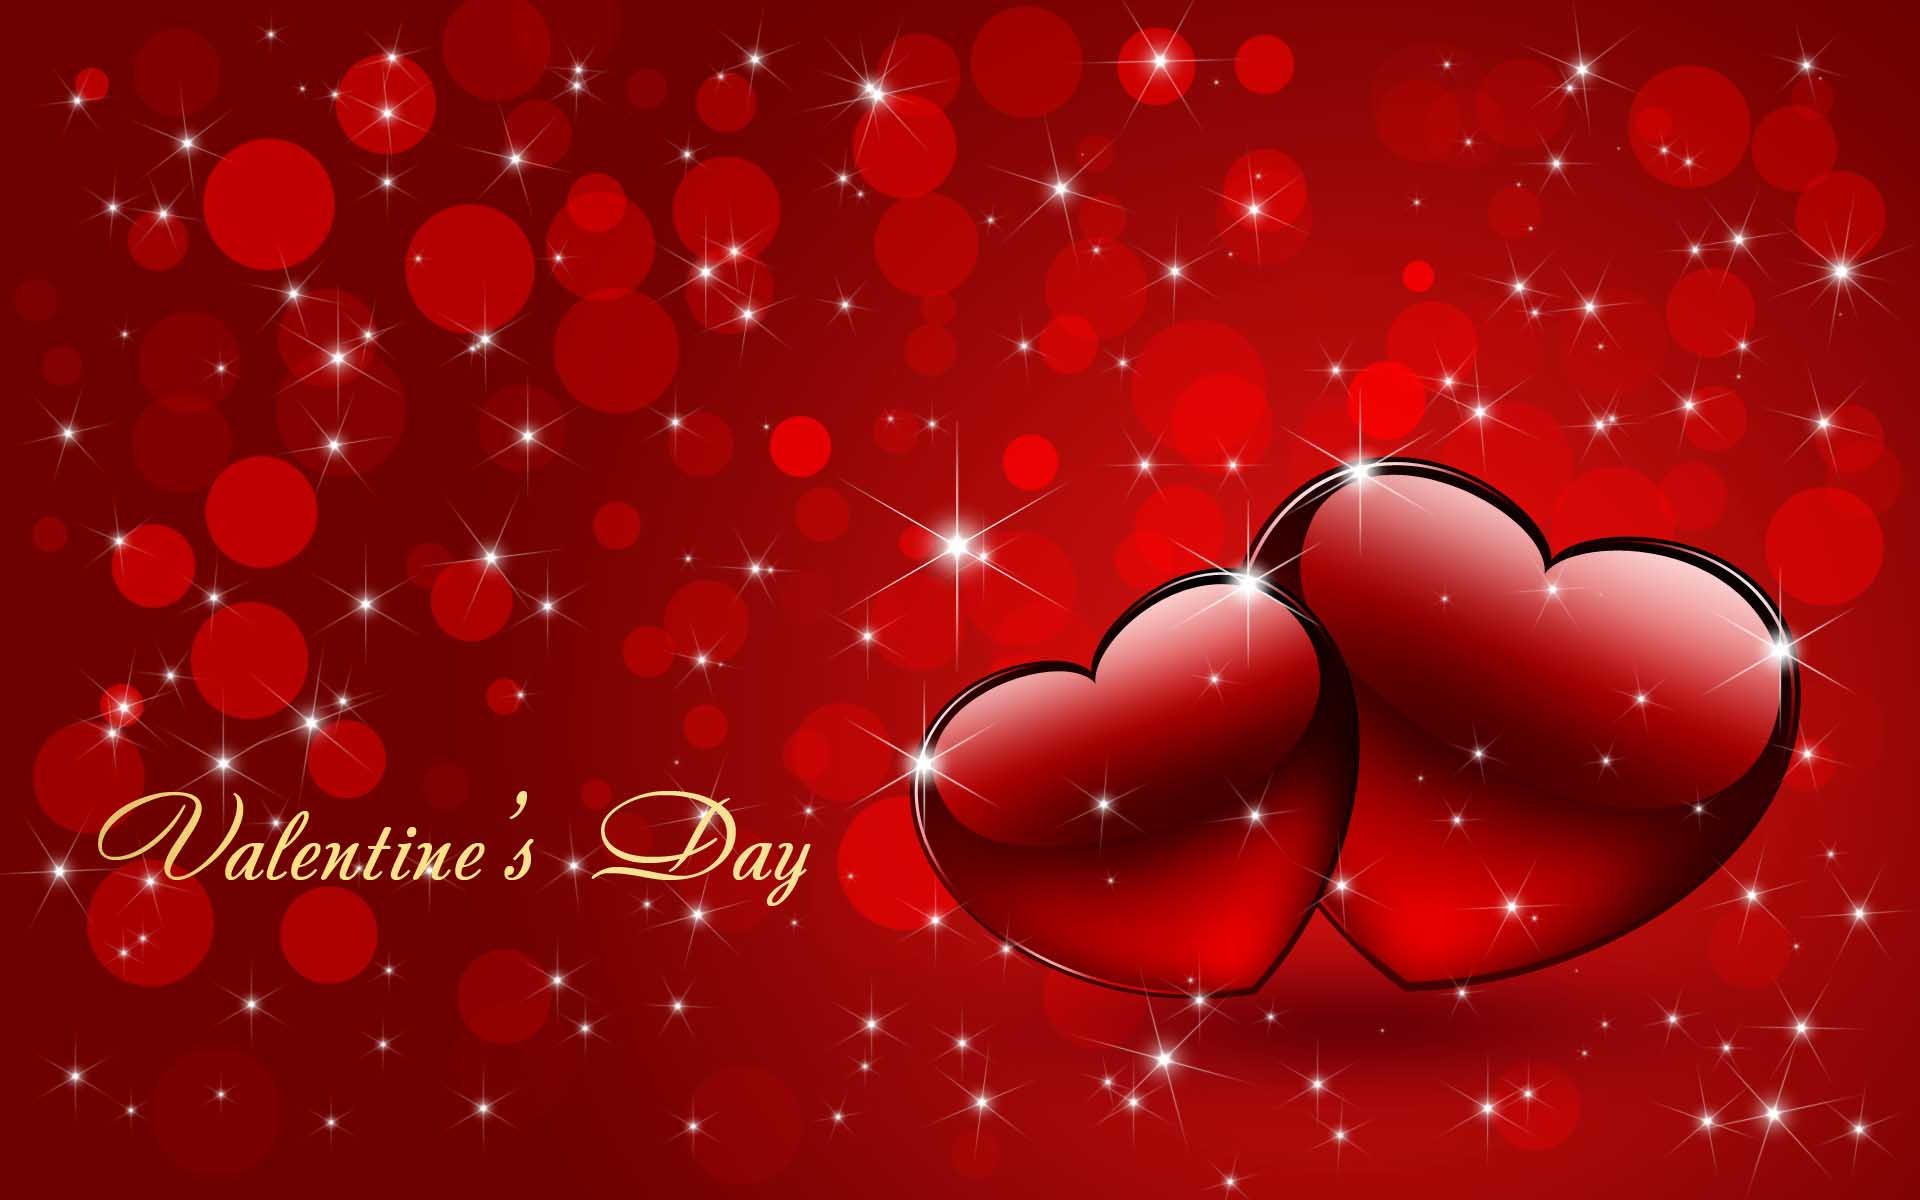 San Valentin Imagenes *•* IMAGENES de AMOR